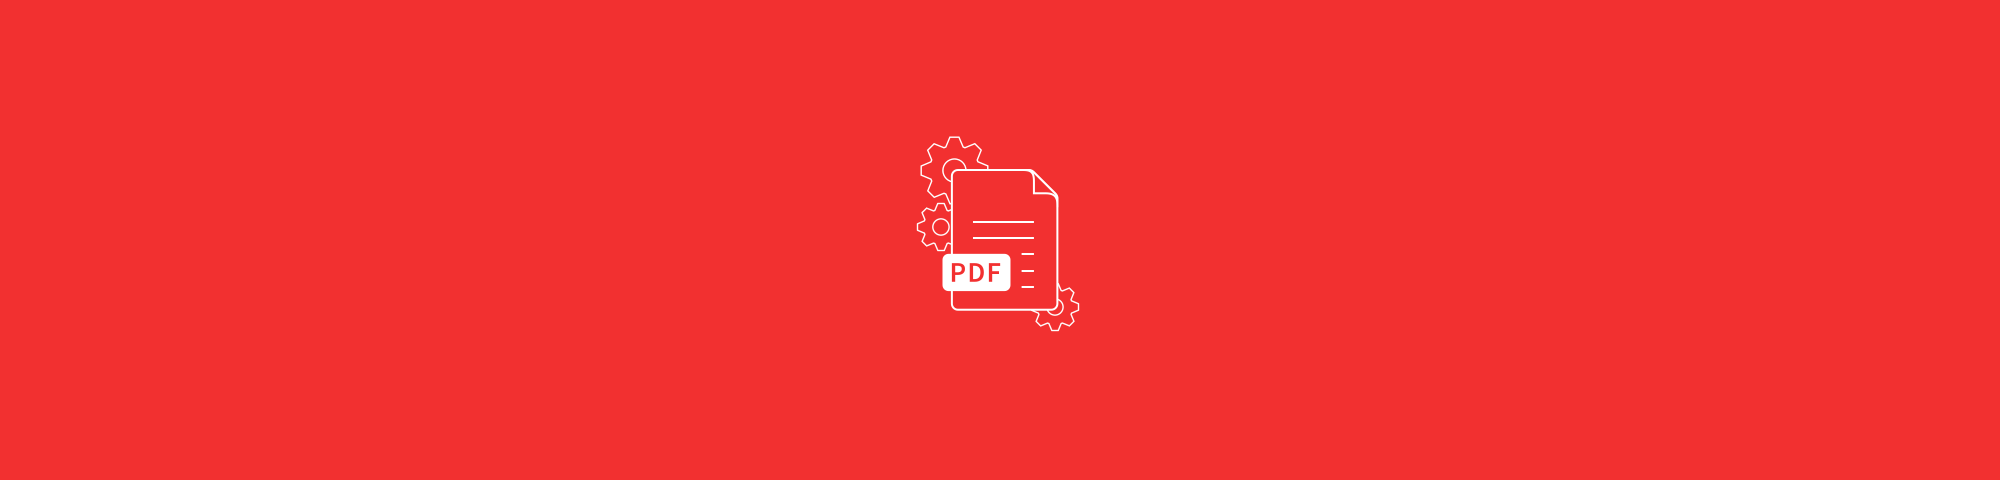 blog-banner: pdf-maker-make-pdf-online-with-one-click@2x